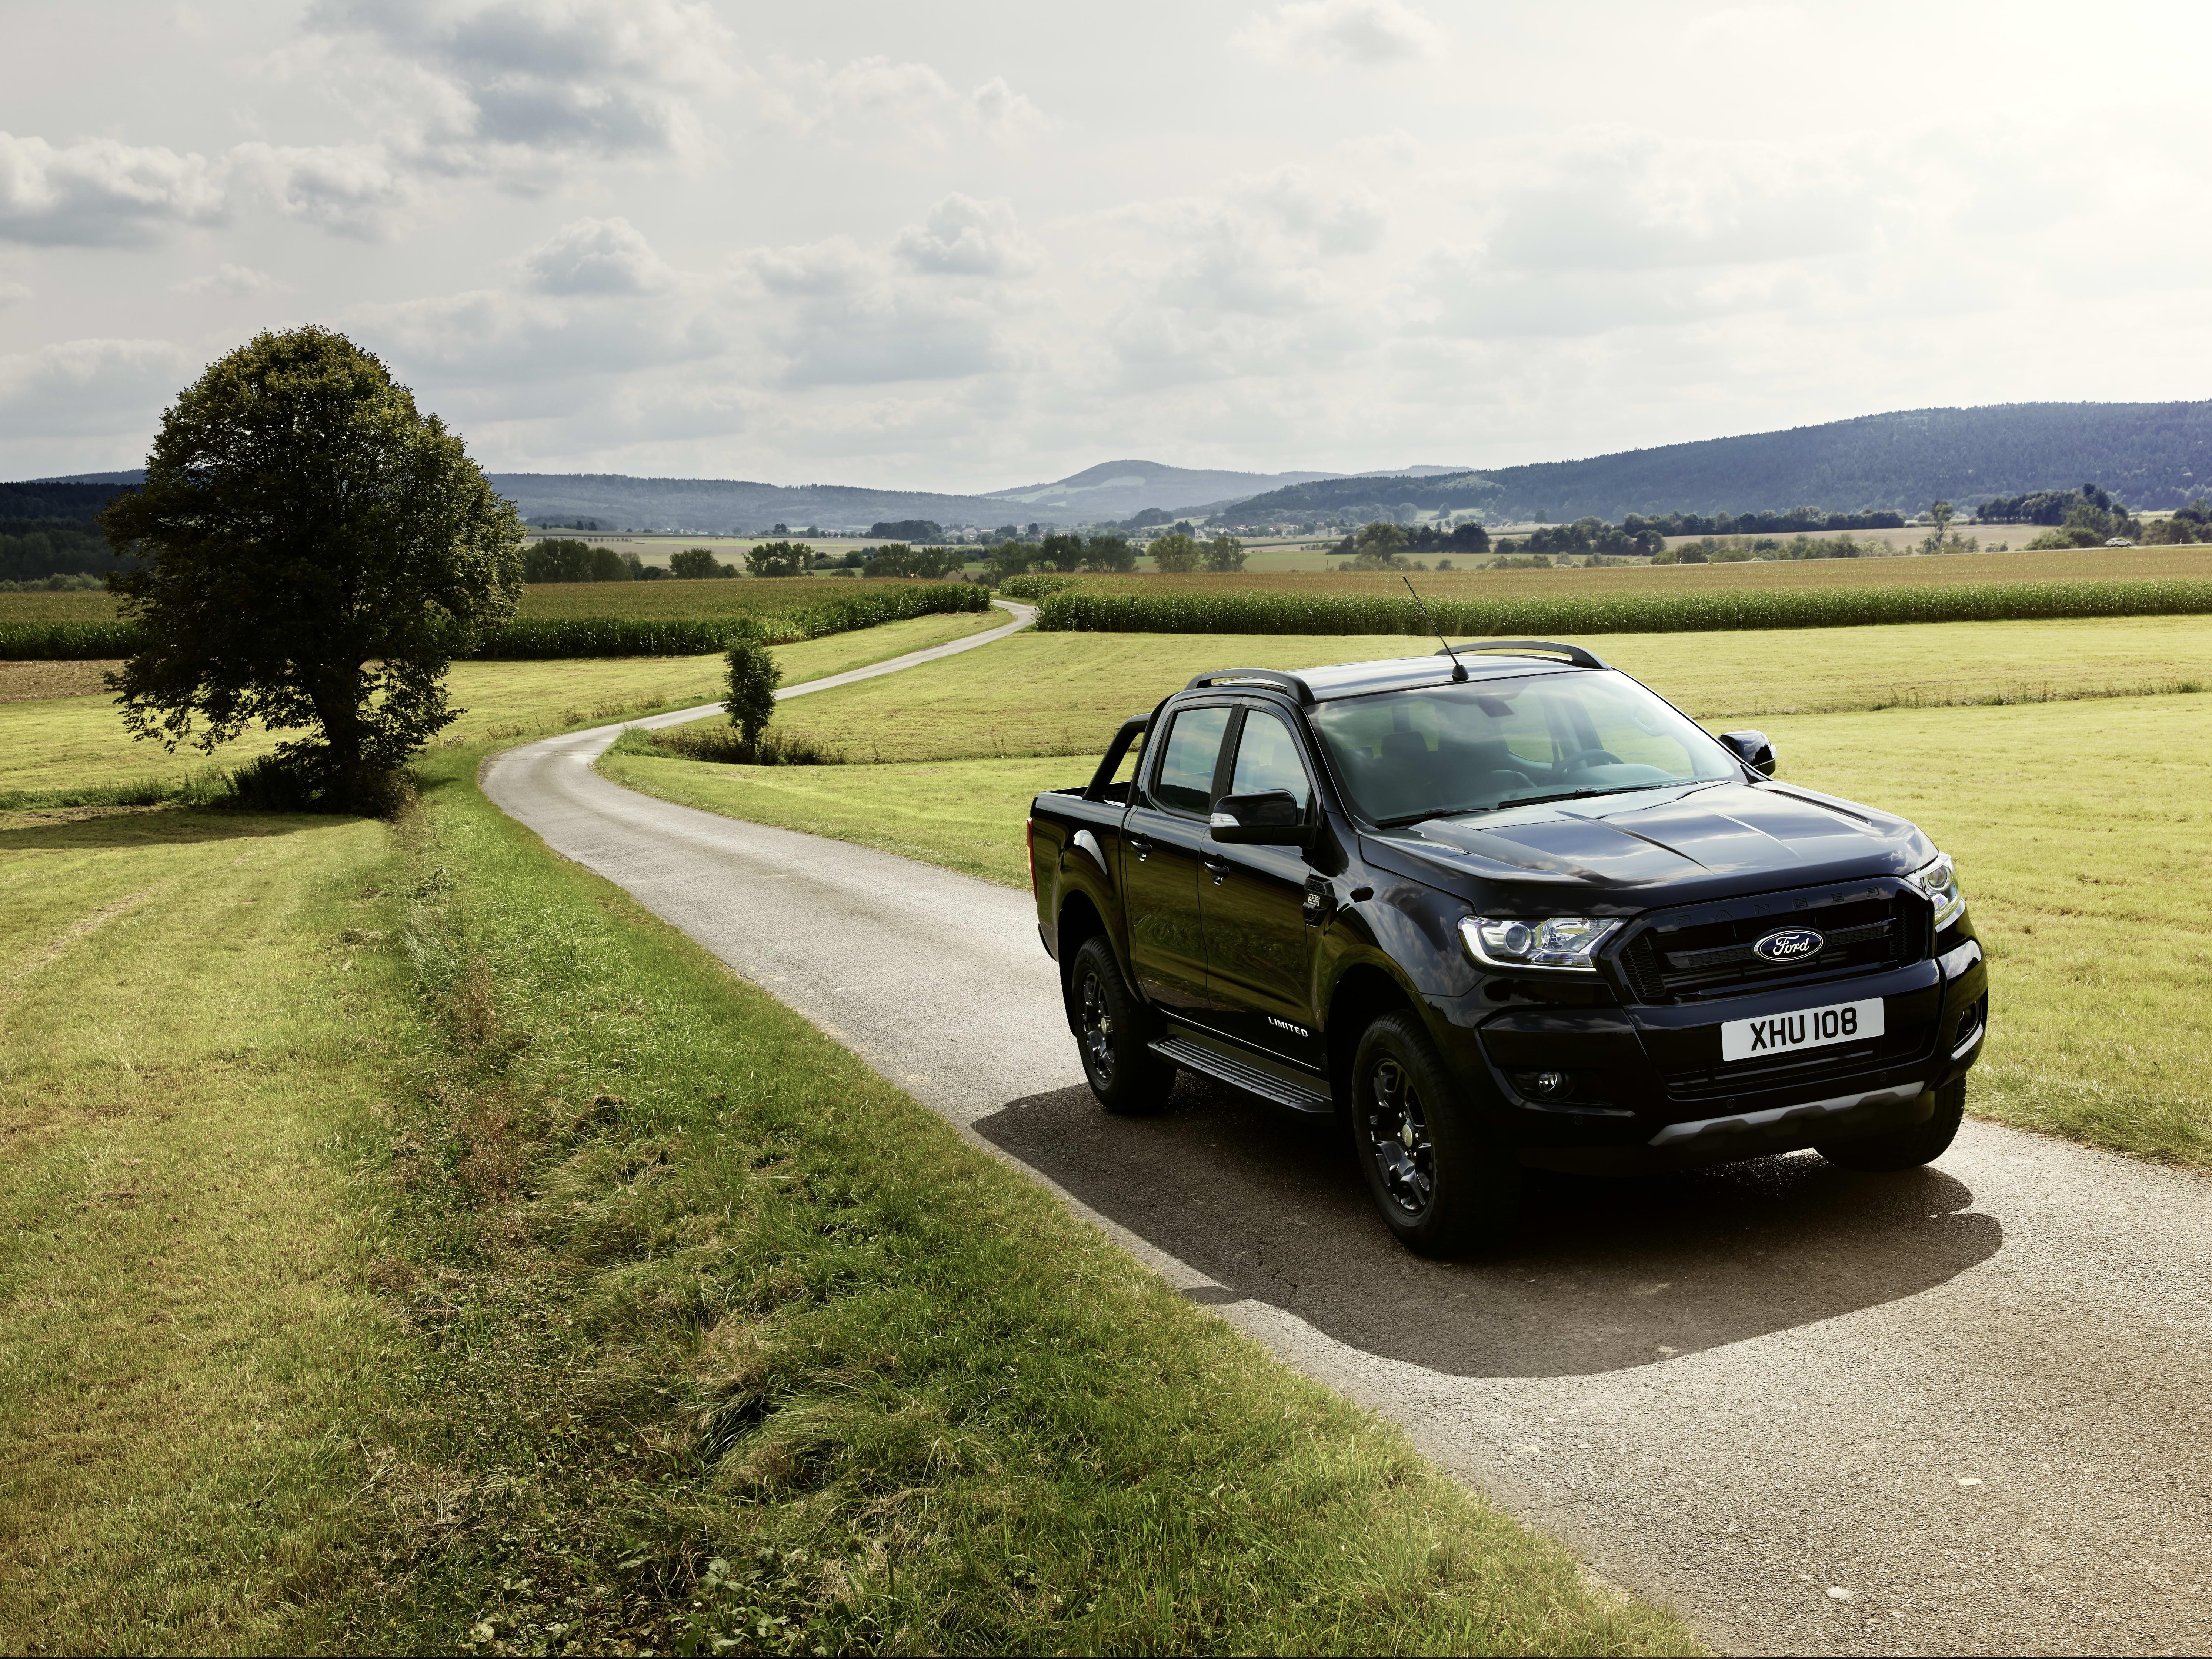 Ford Motor Company - Ford i Danmark